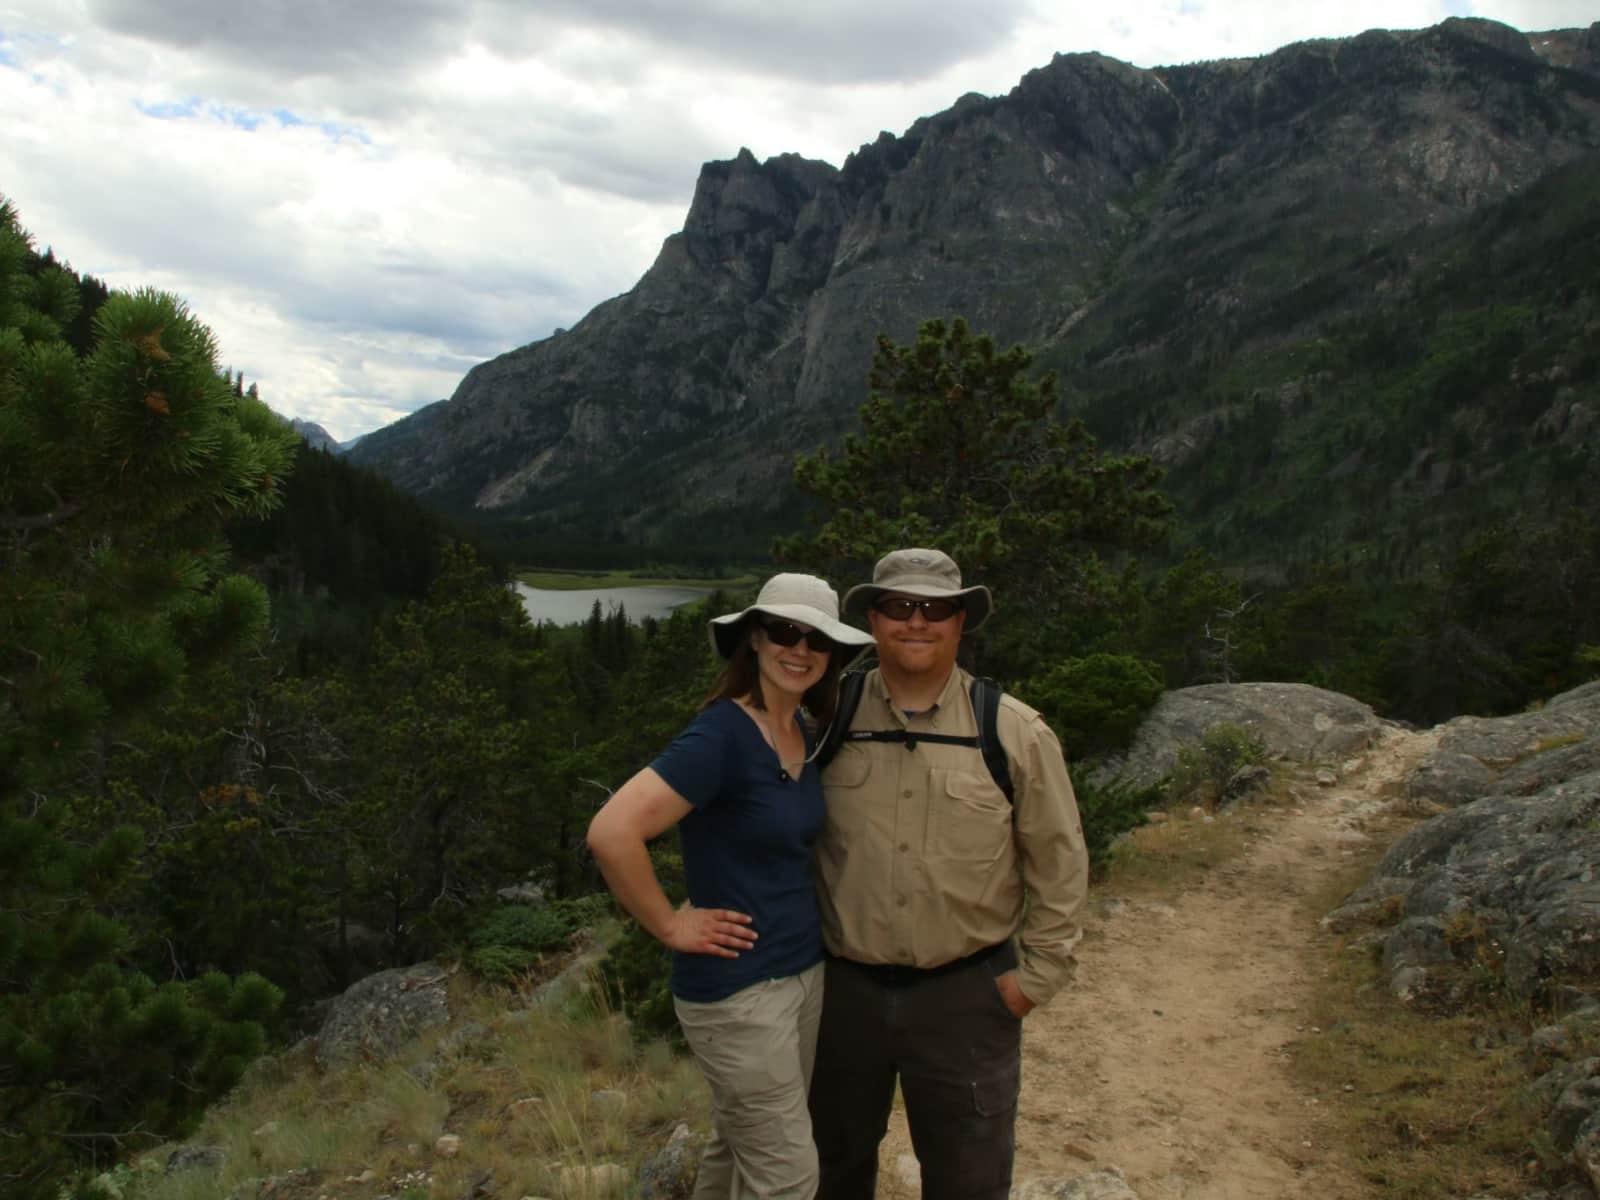 Aubrey & Justin from Grand Forks, North Dakota, United States